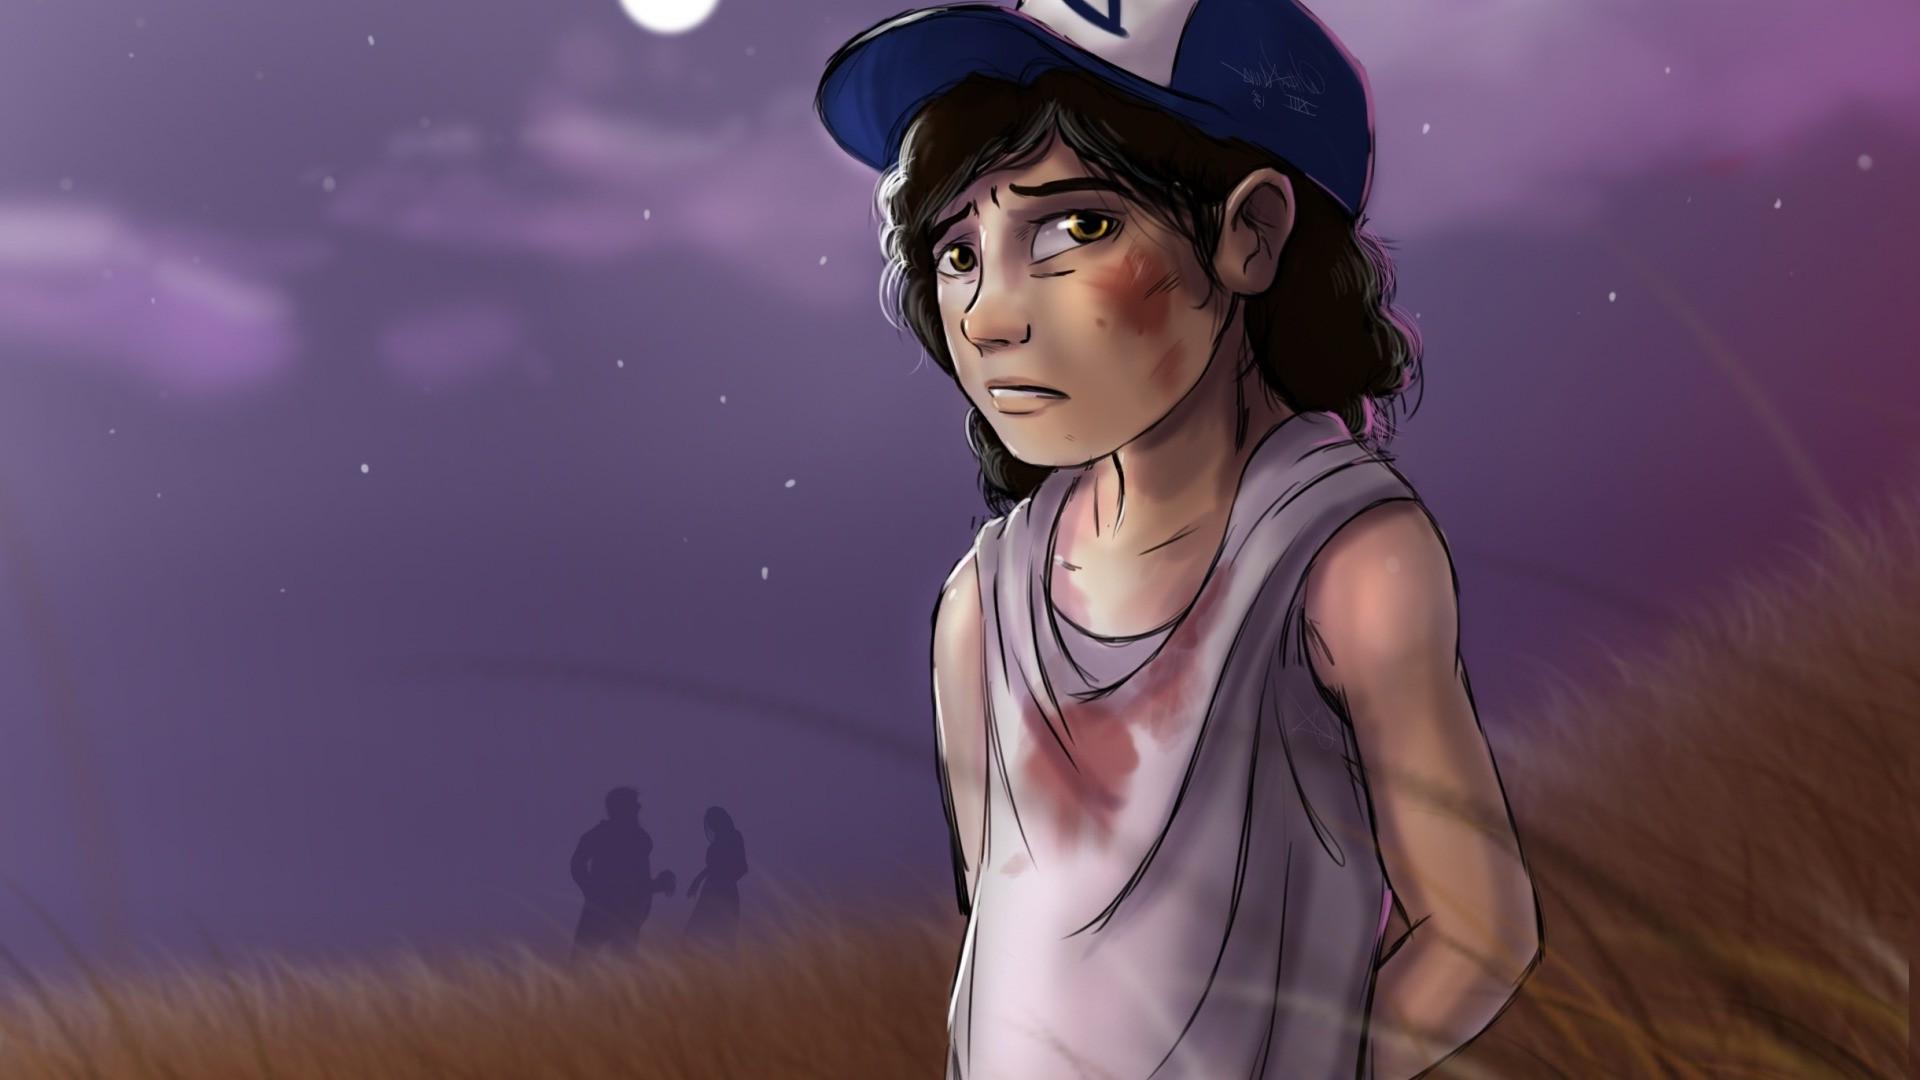 Wallpaper Video Games Artwork The Walking Dead Person